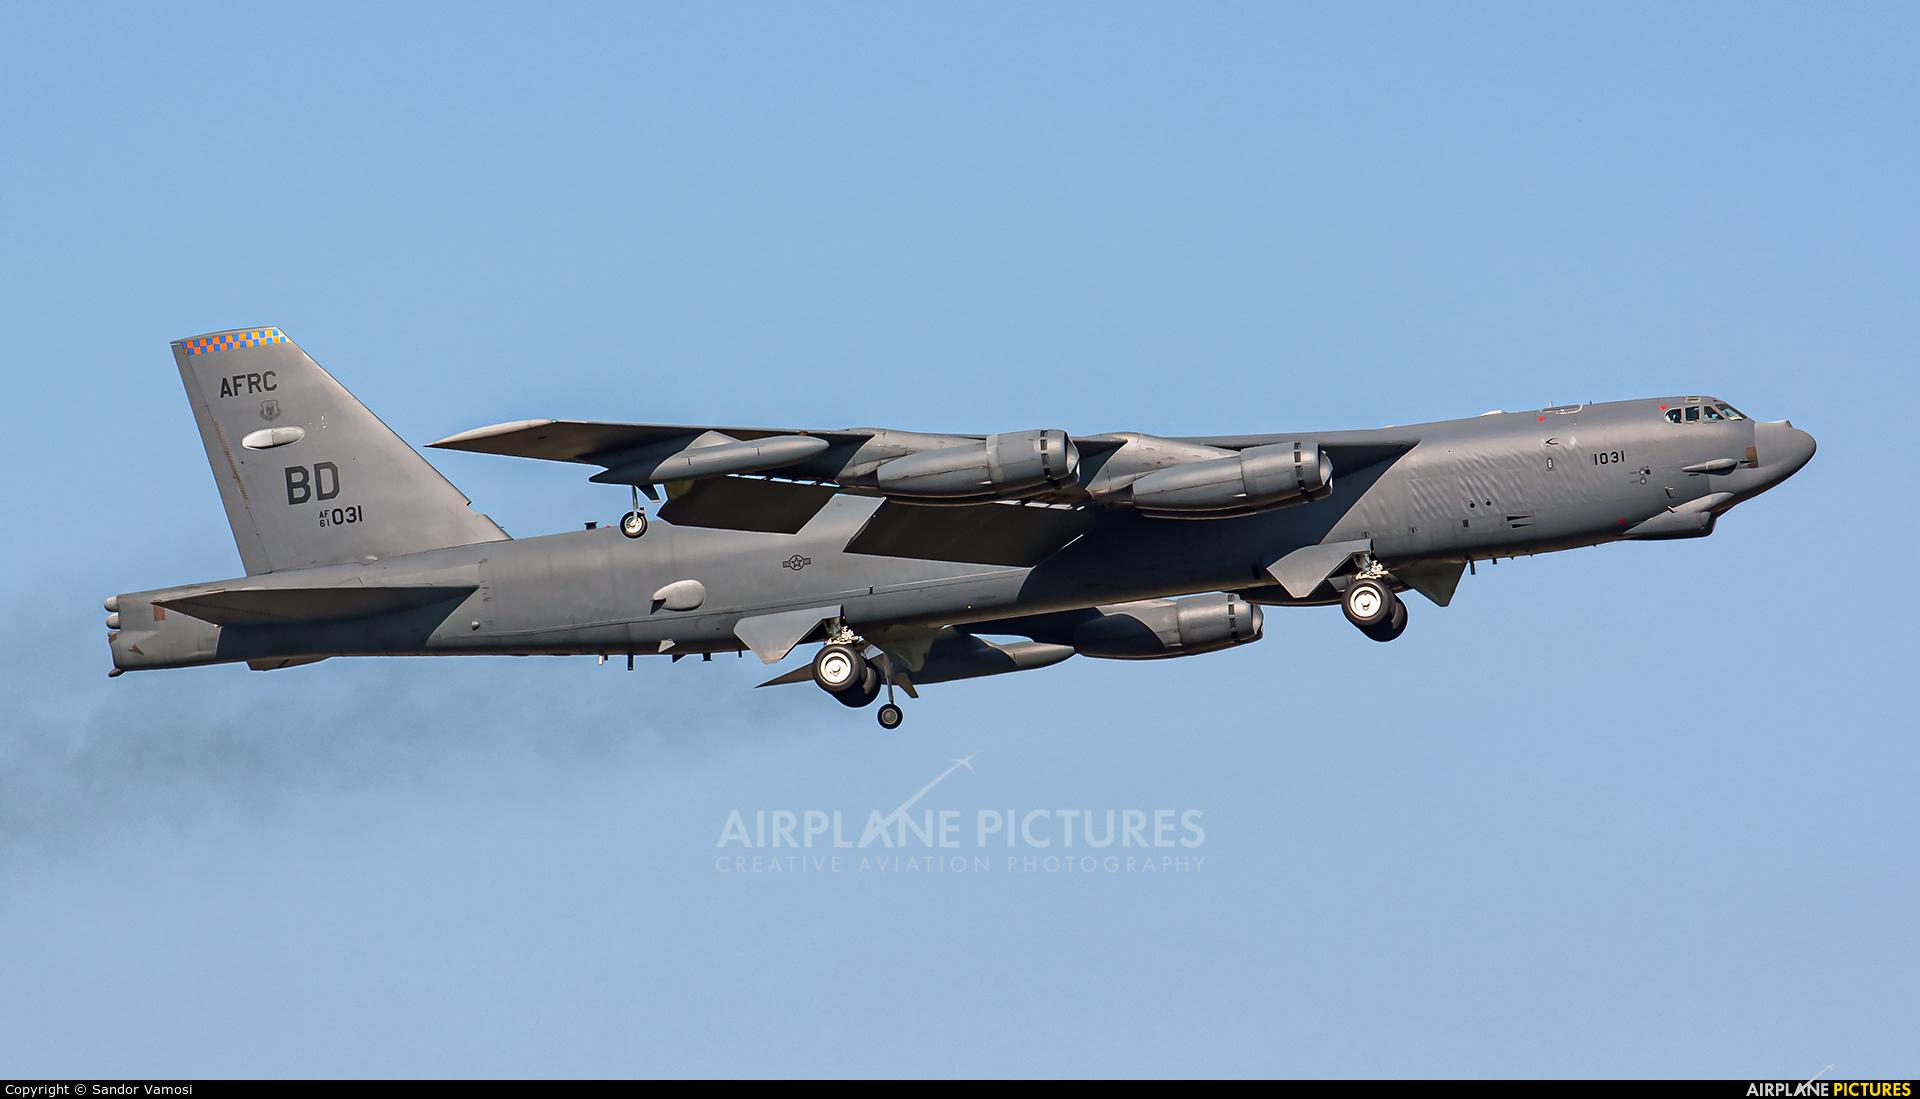 USA - Air Force AFRC 61-0031 aircraft at Ostrava Mošnov